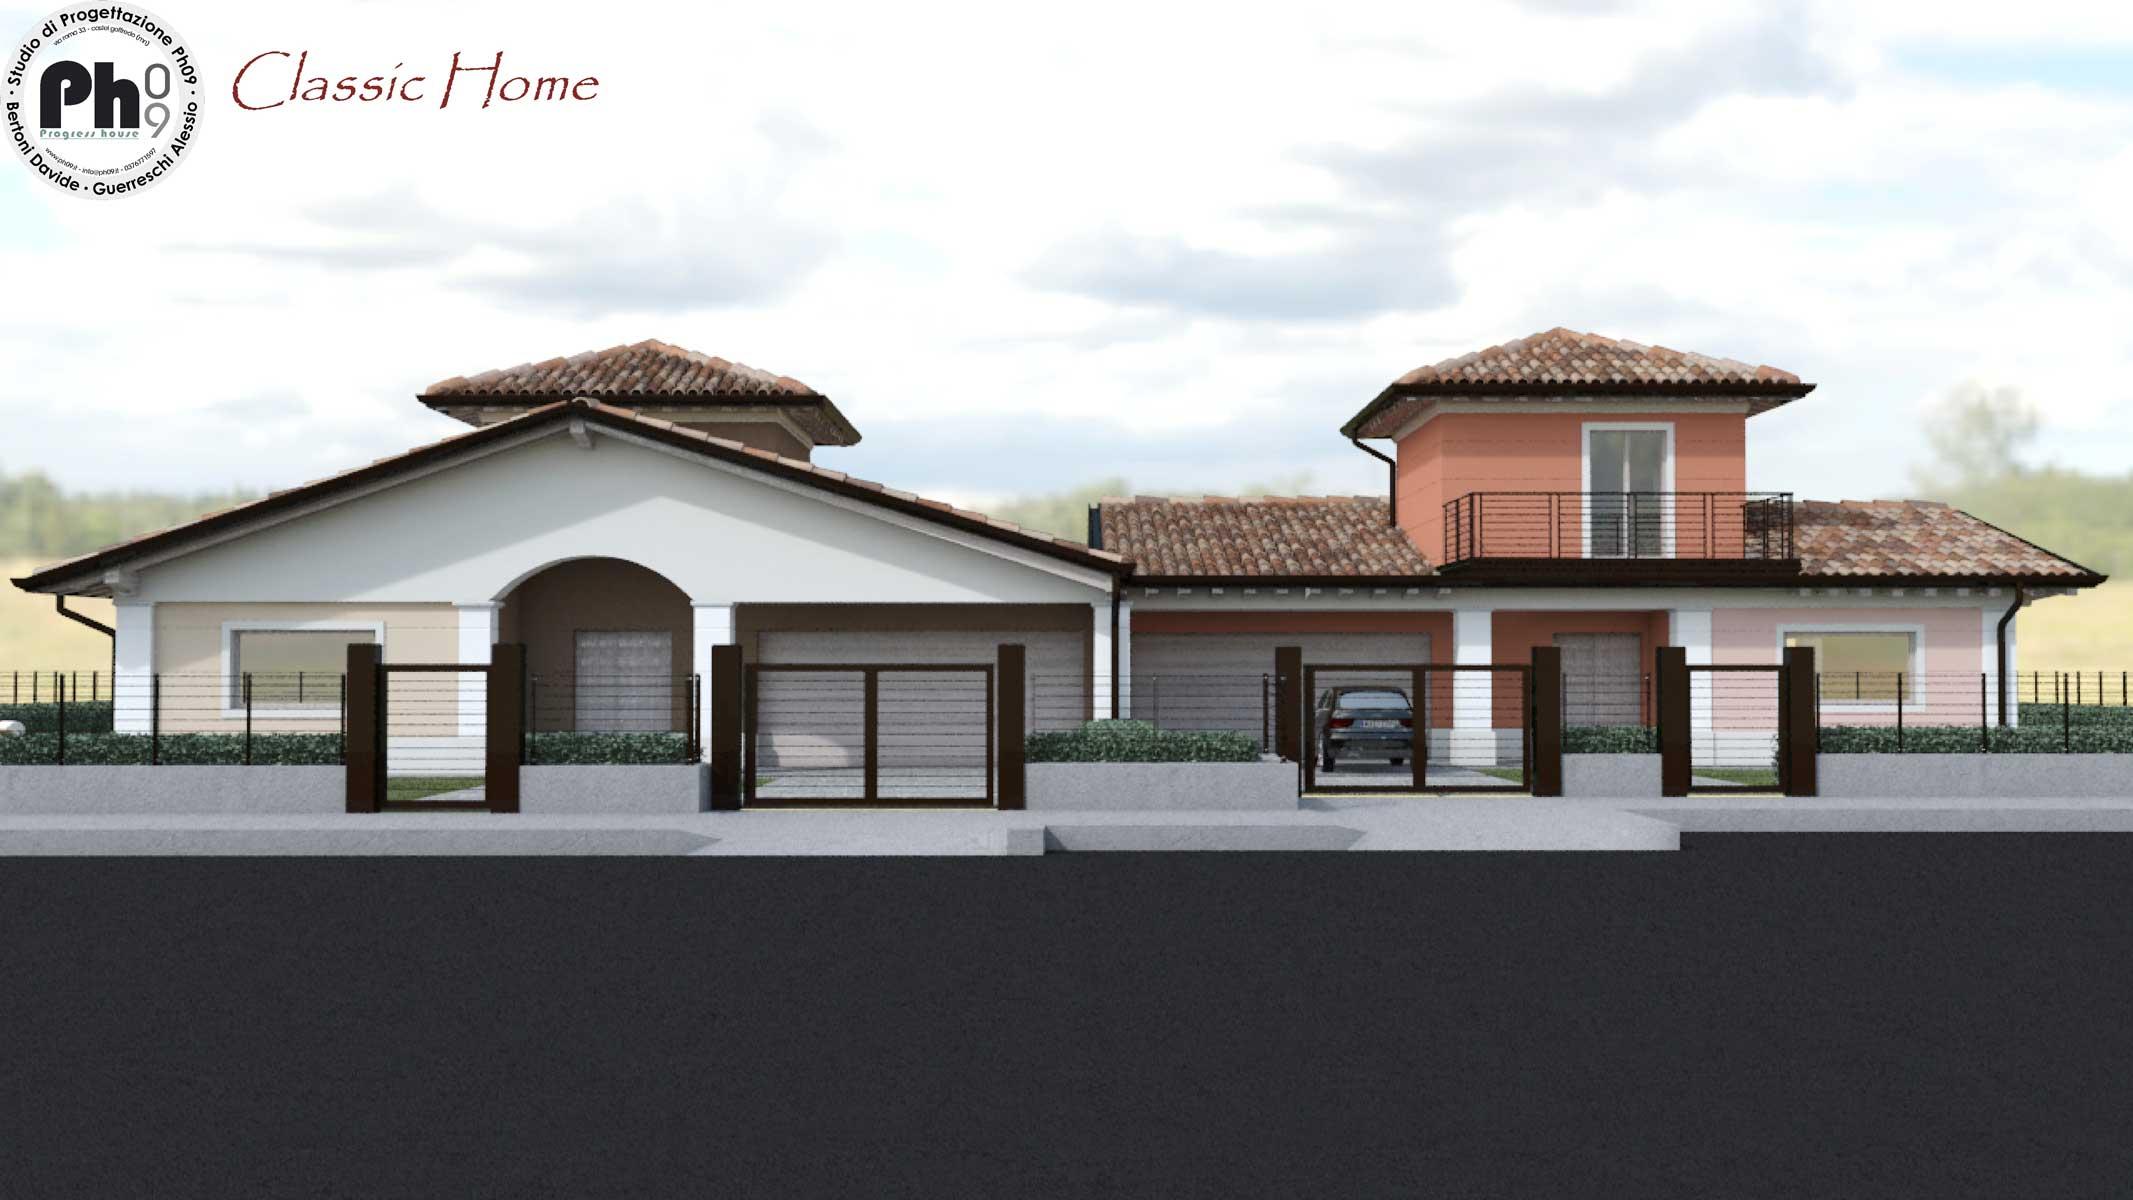 Classic-Home-Polenta-(8)